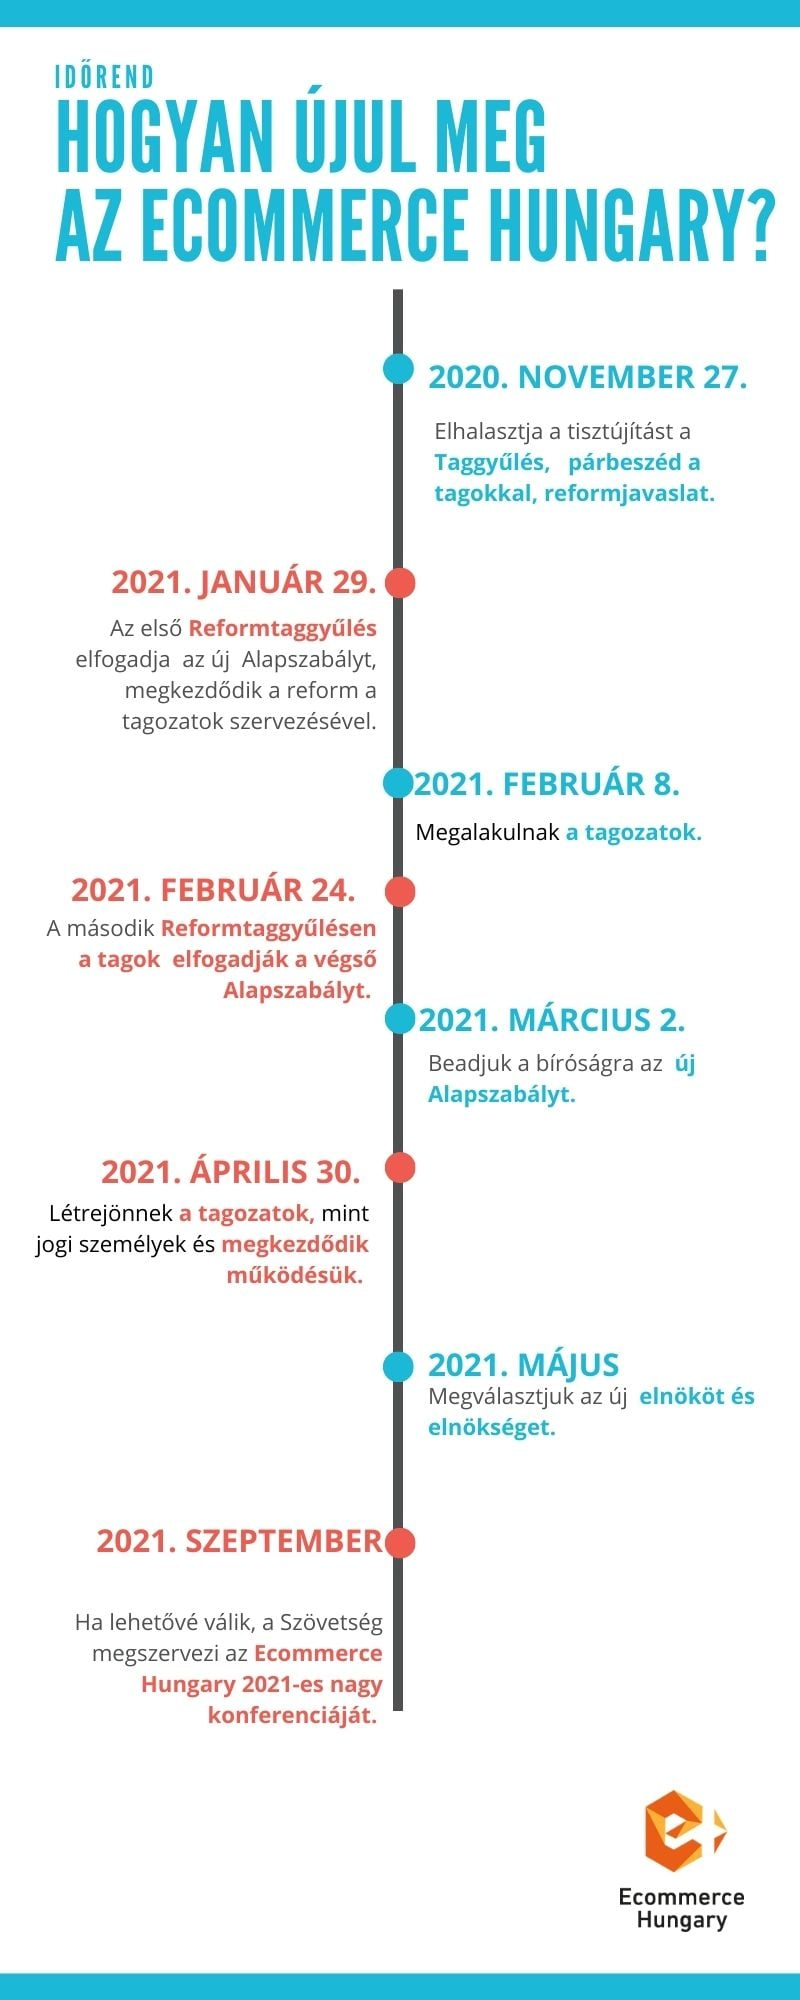 Átalakul az Ecommerce Hungary